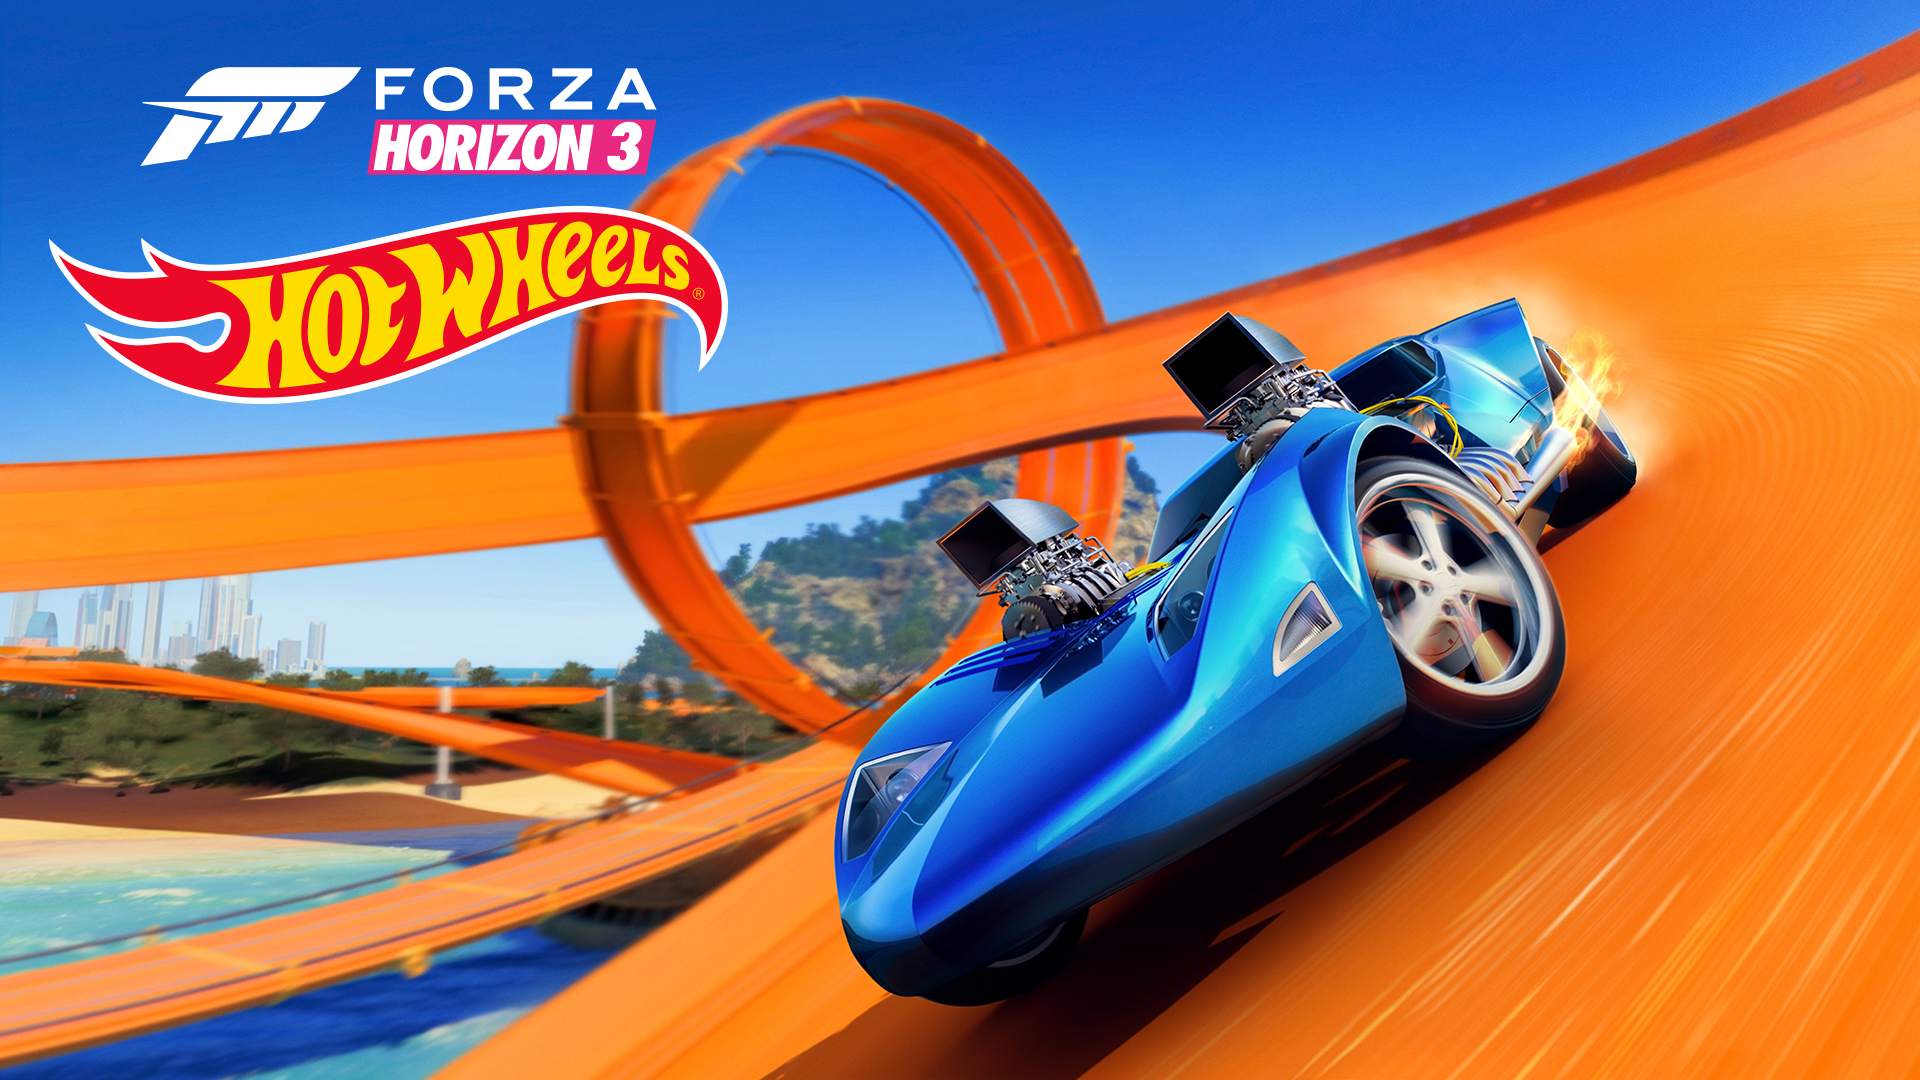 Hot Wheels DLC Racing Into Forza Horizon 3 Next Month